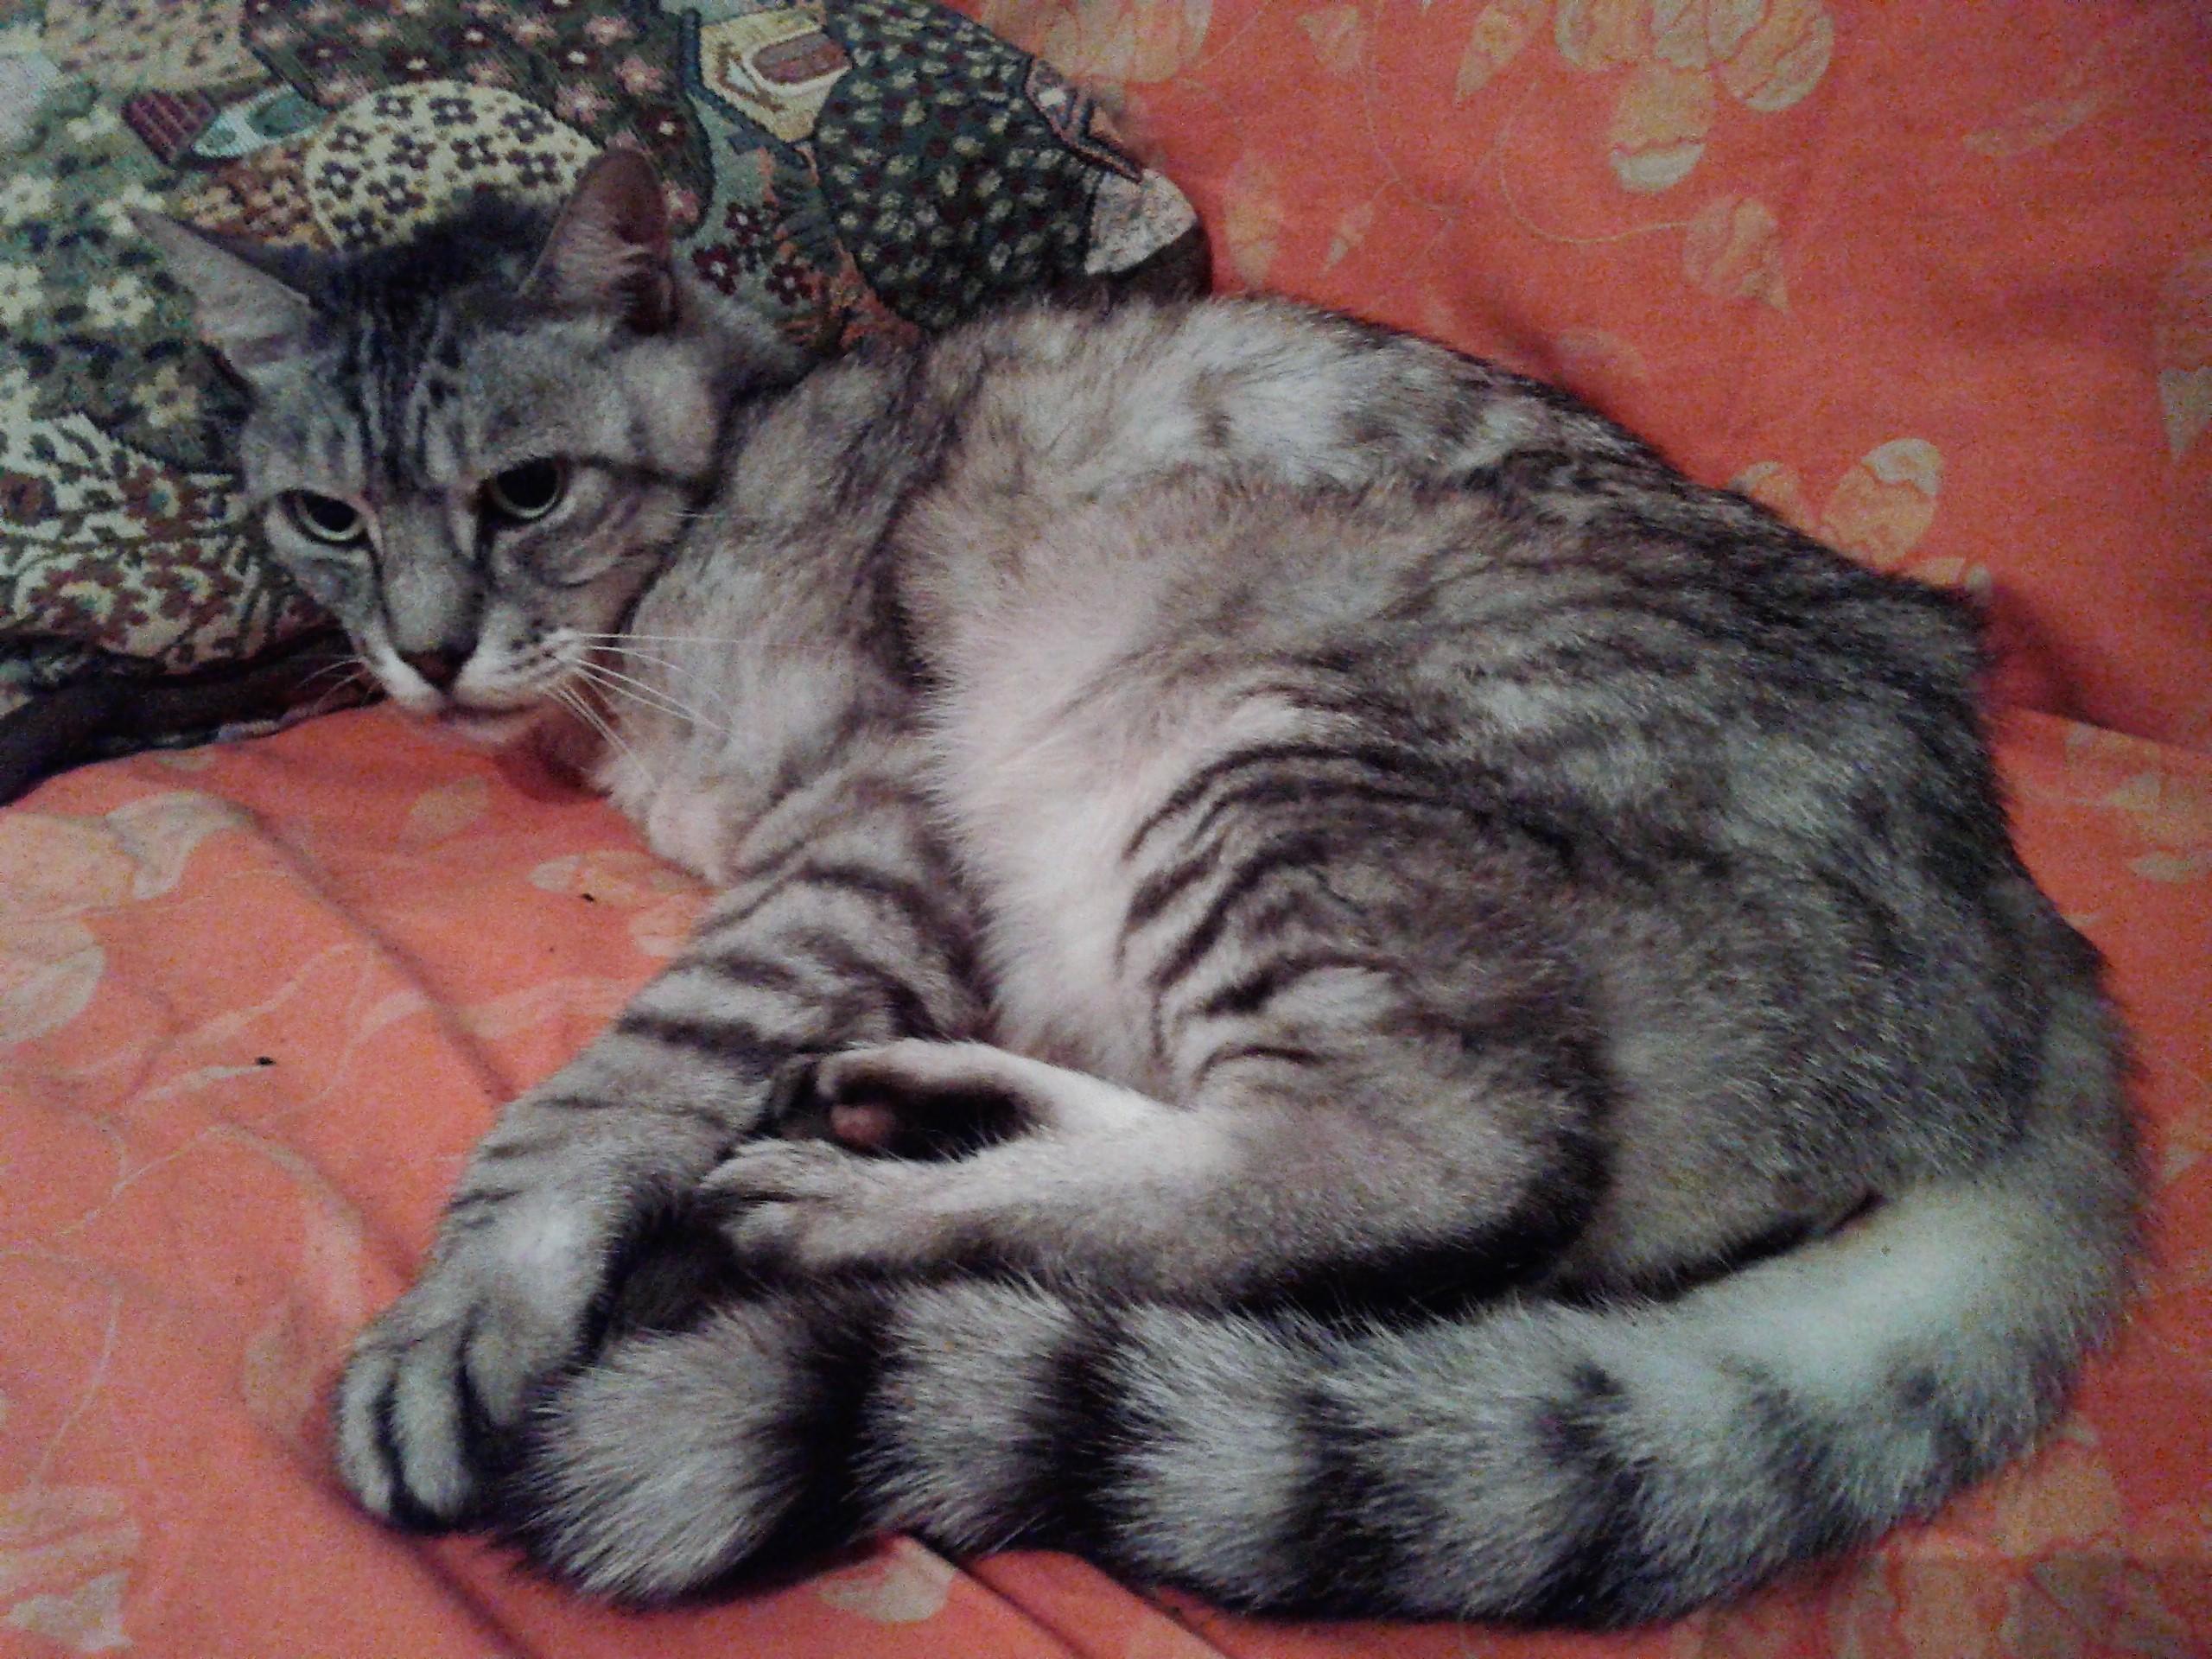 FIV: il virus dell' immunodeFicienza felina